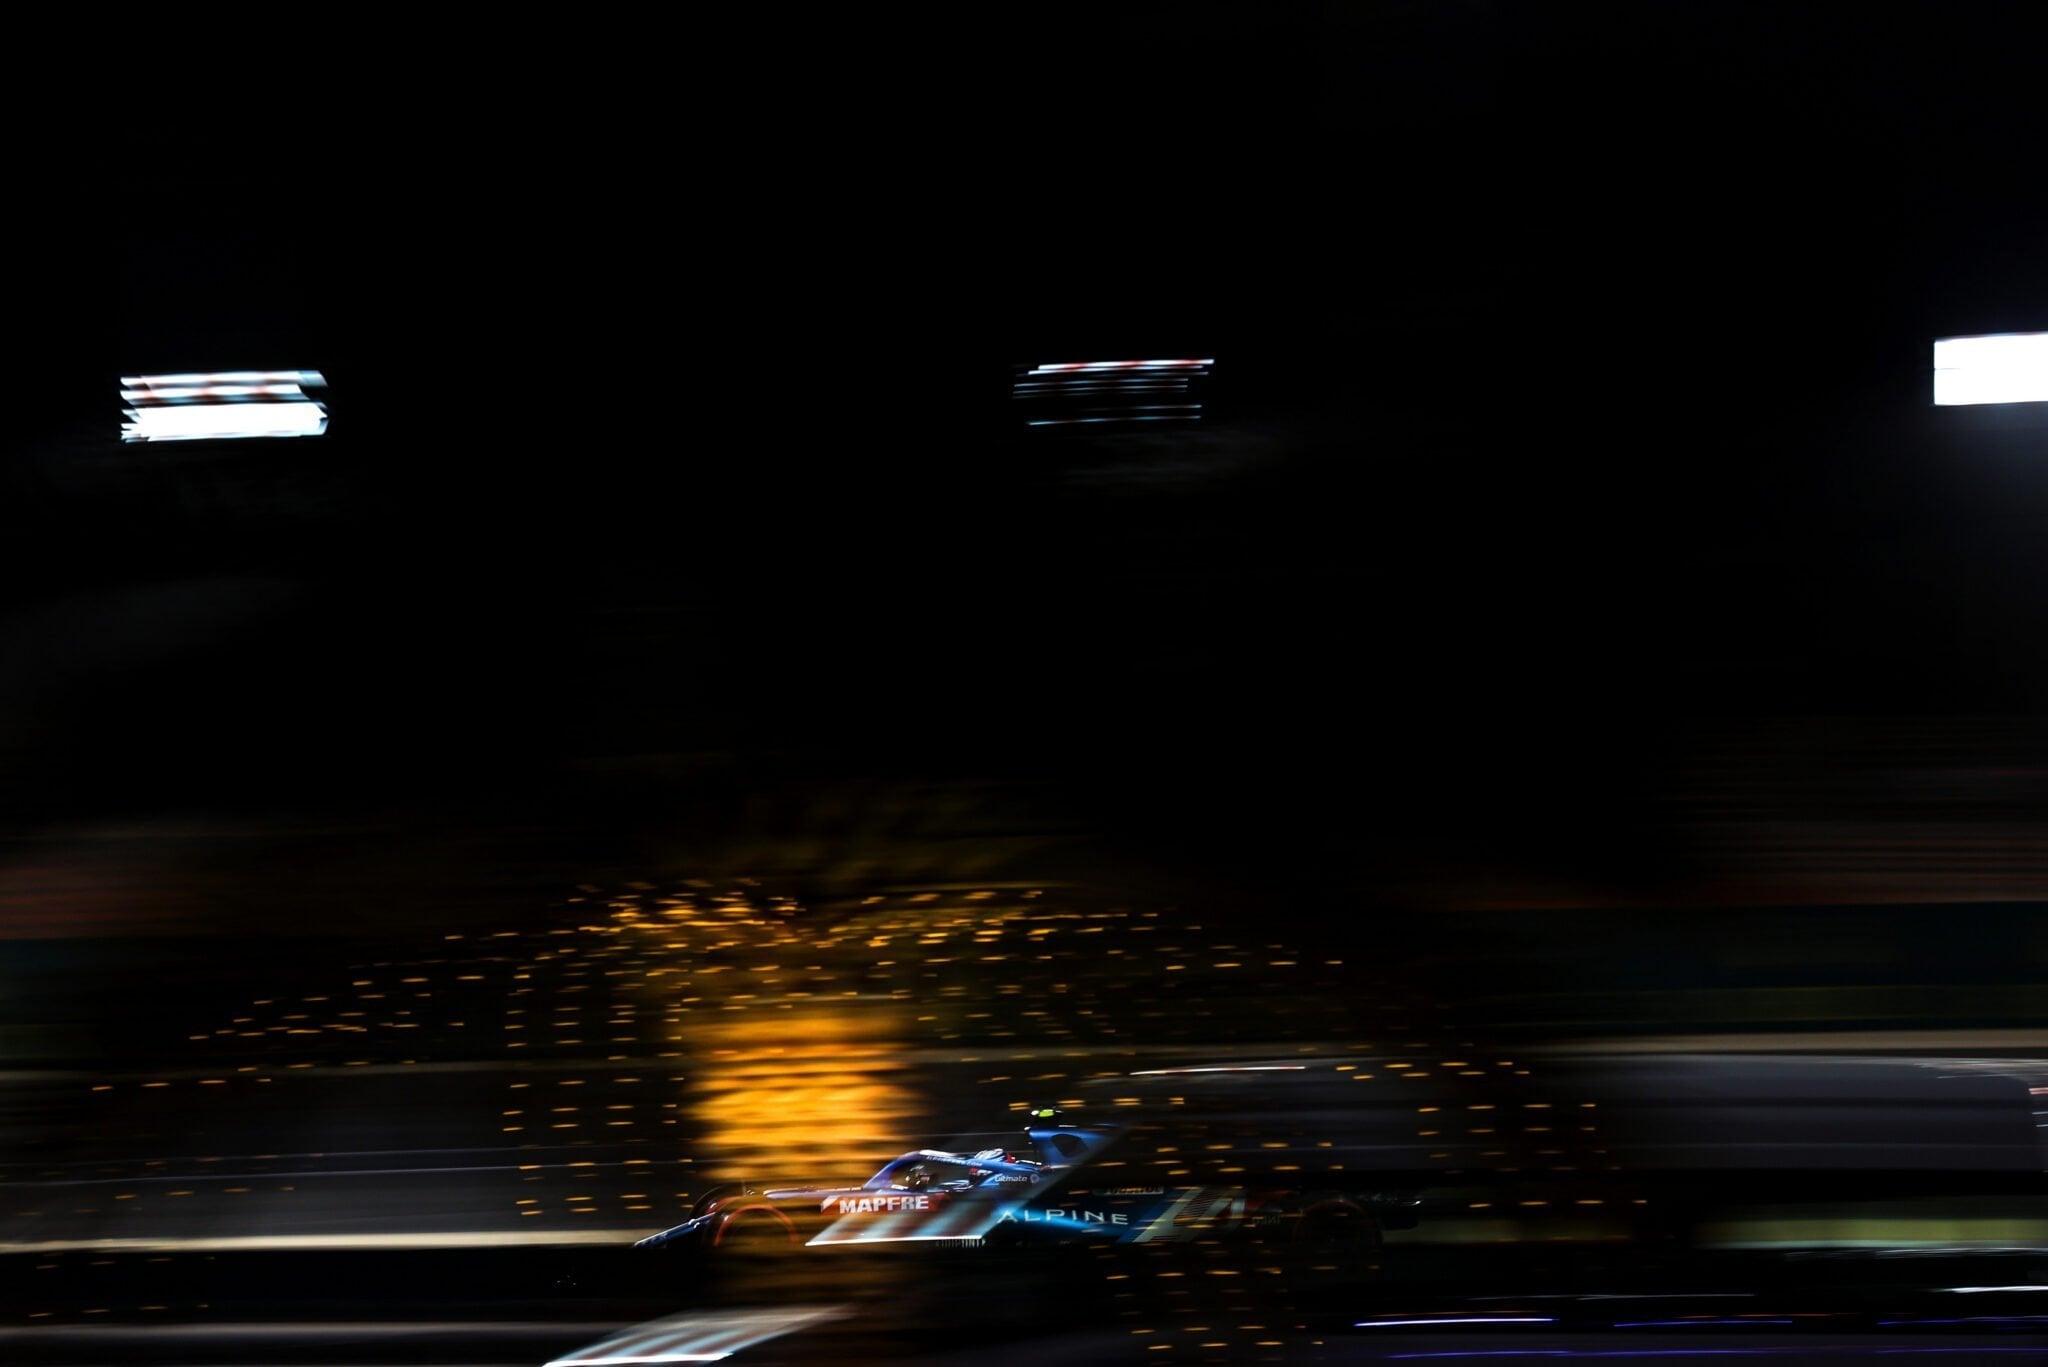 Alpine F1 Team Alonso Ocon A521 Bahrein